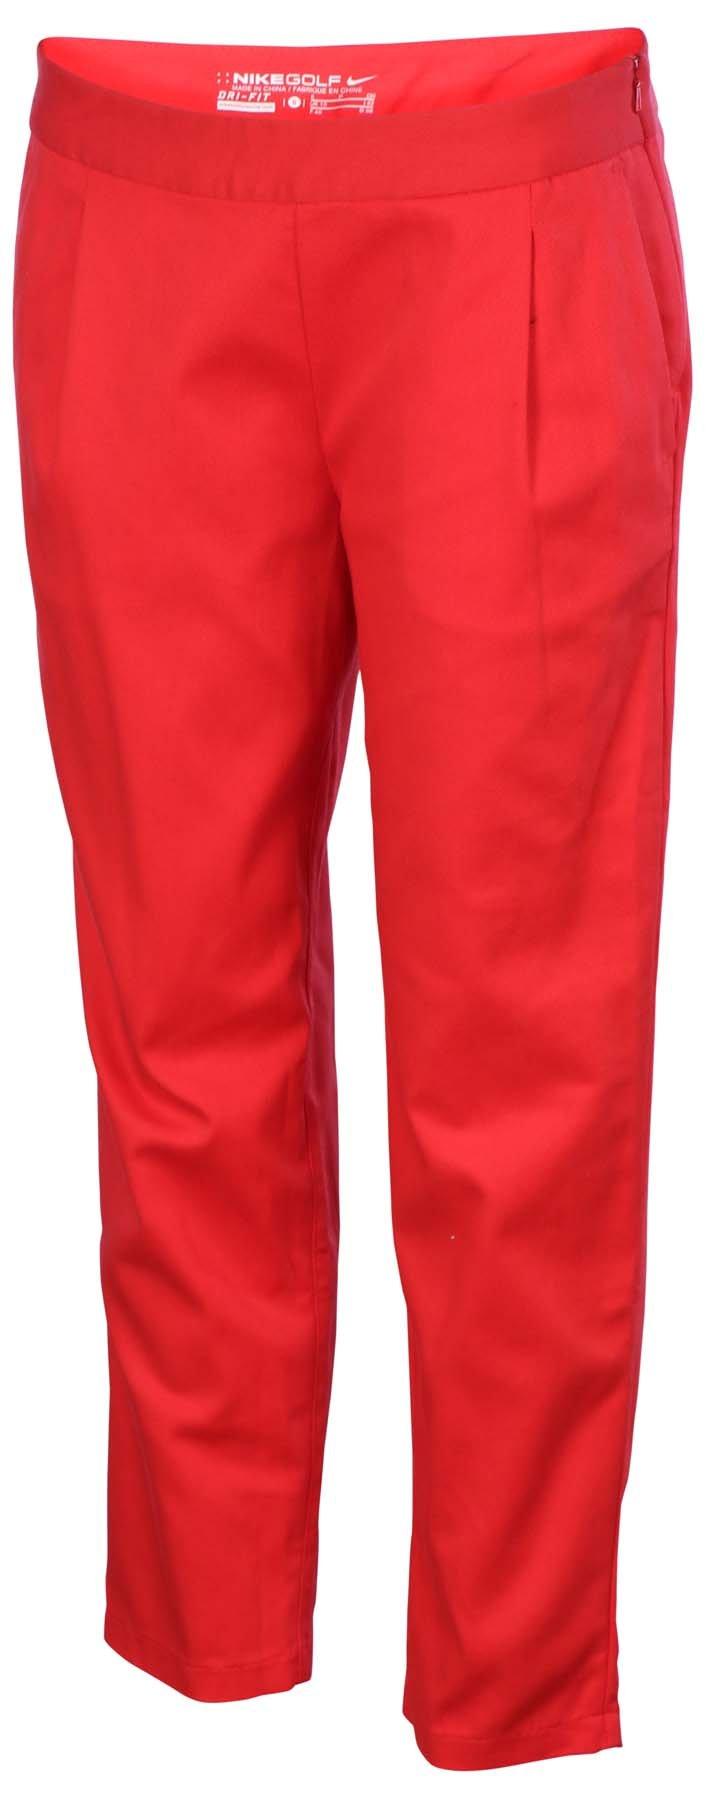 Nike Golf Women's Majors Solid Pants University Red/University Red 12 X 25